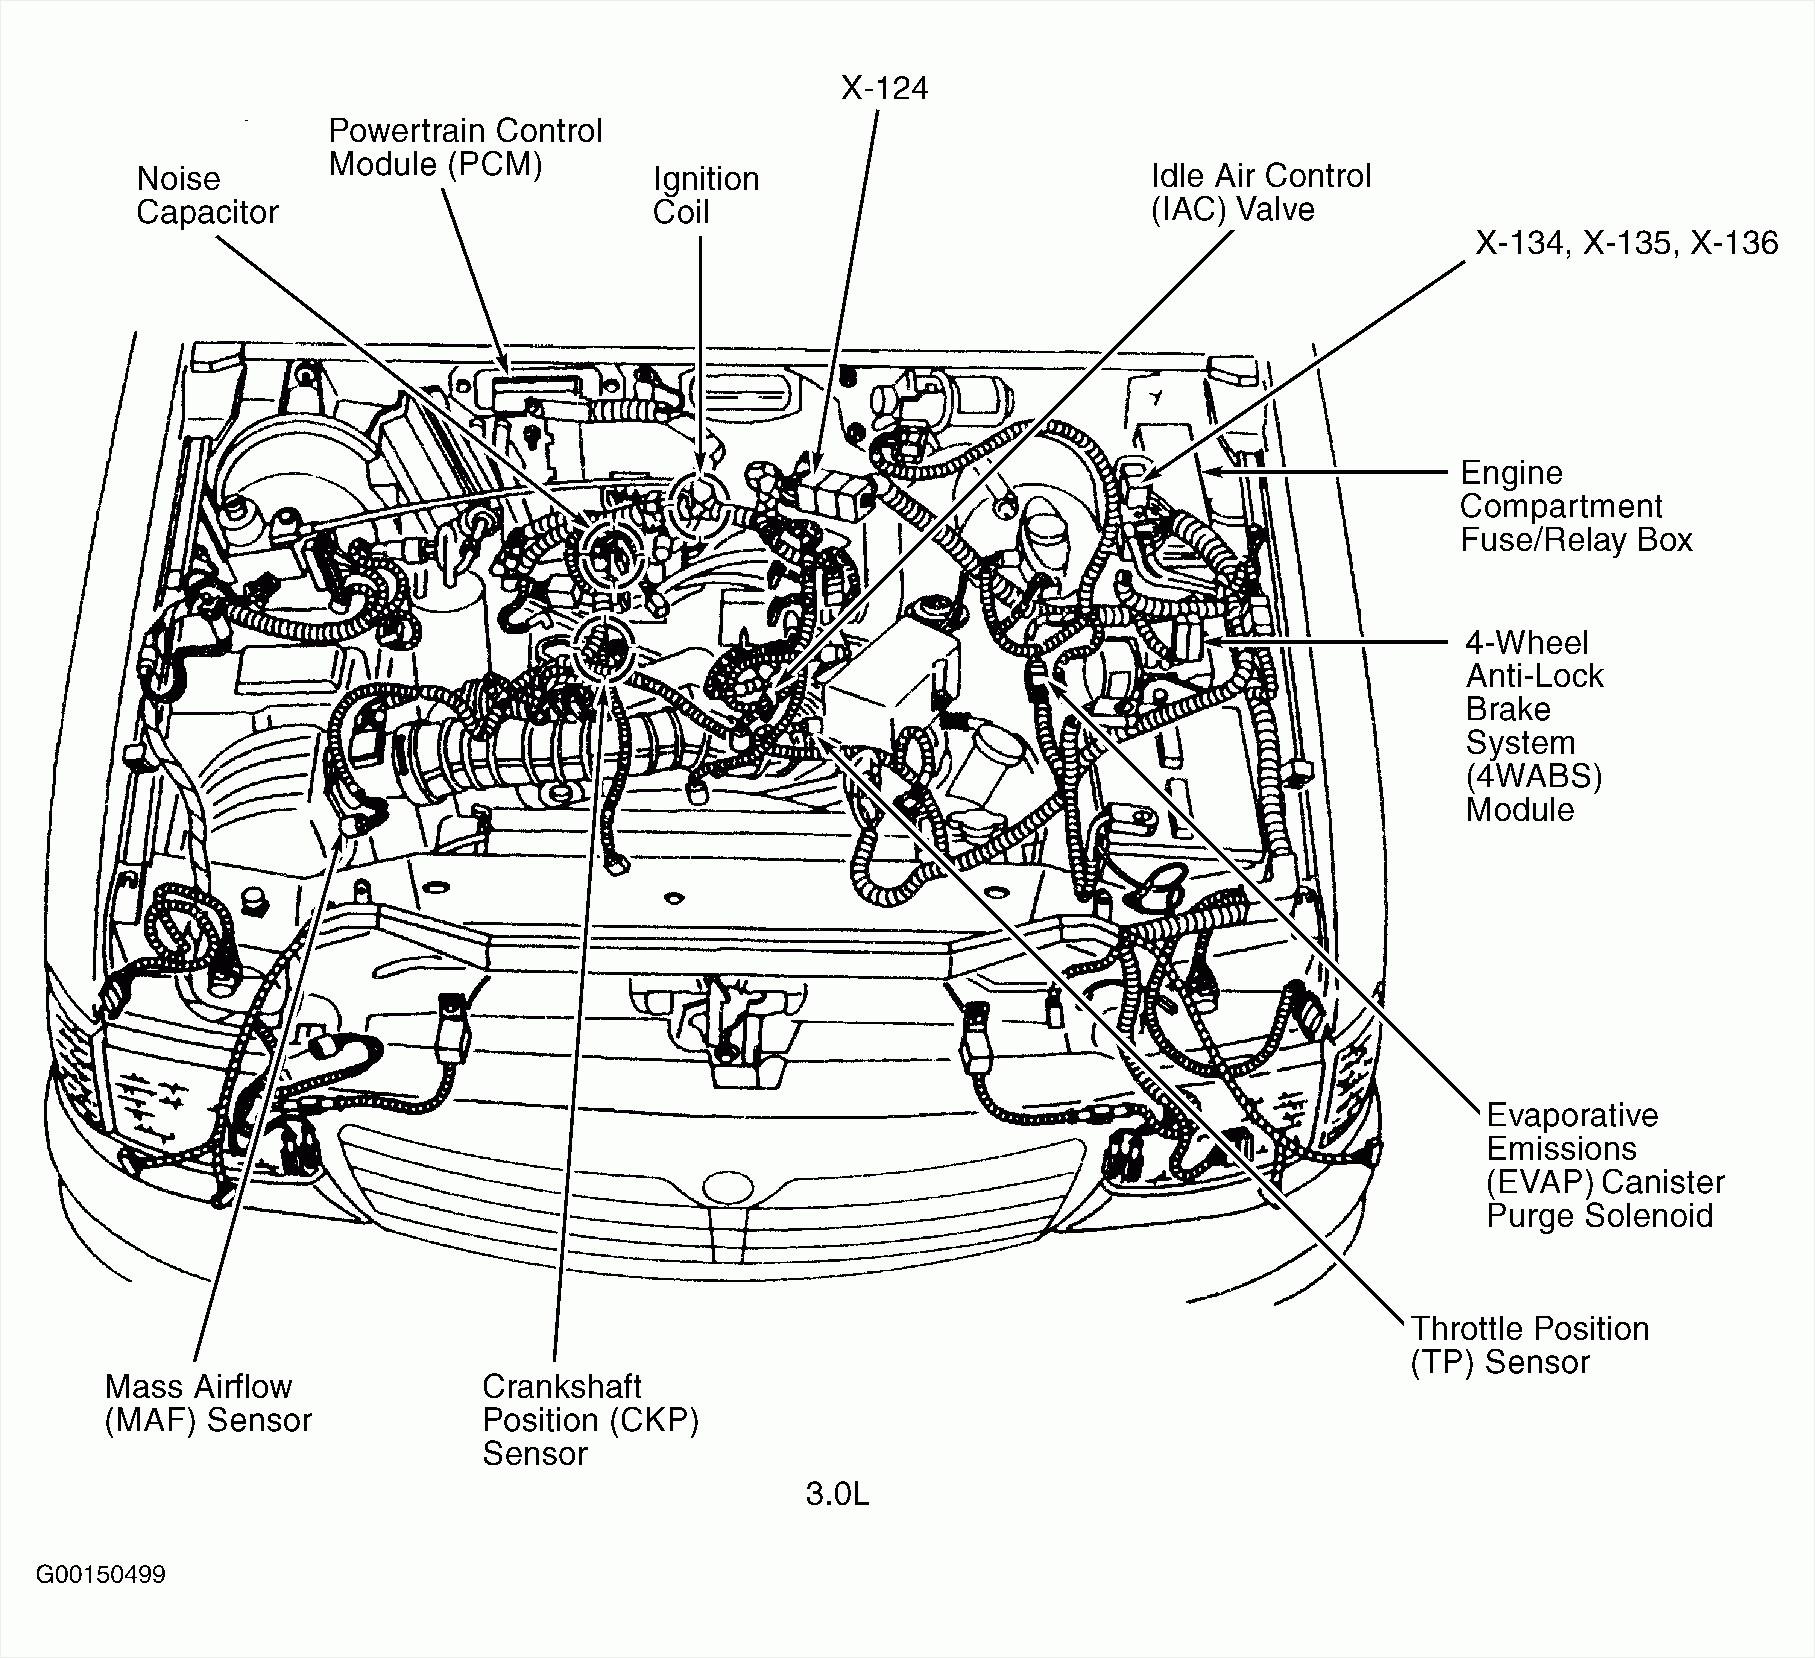 2004 Mazda Tribute Engine Diagram Free Wiring Diagram For You